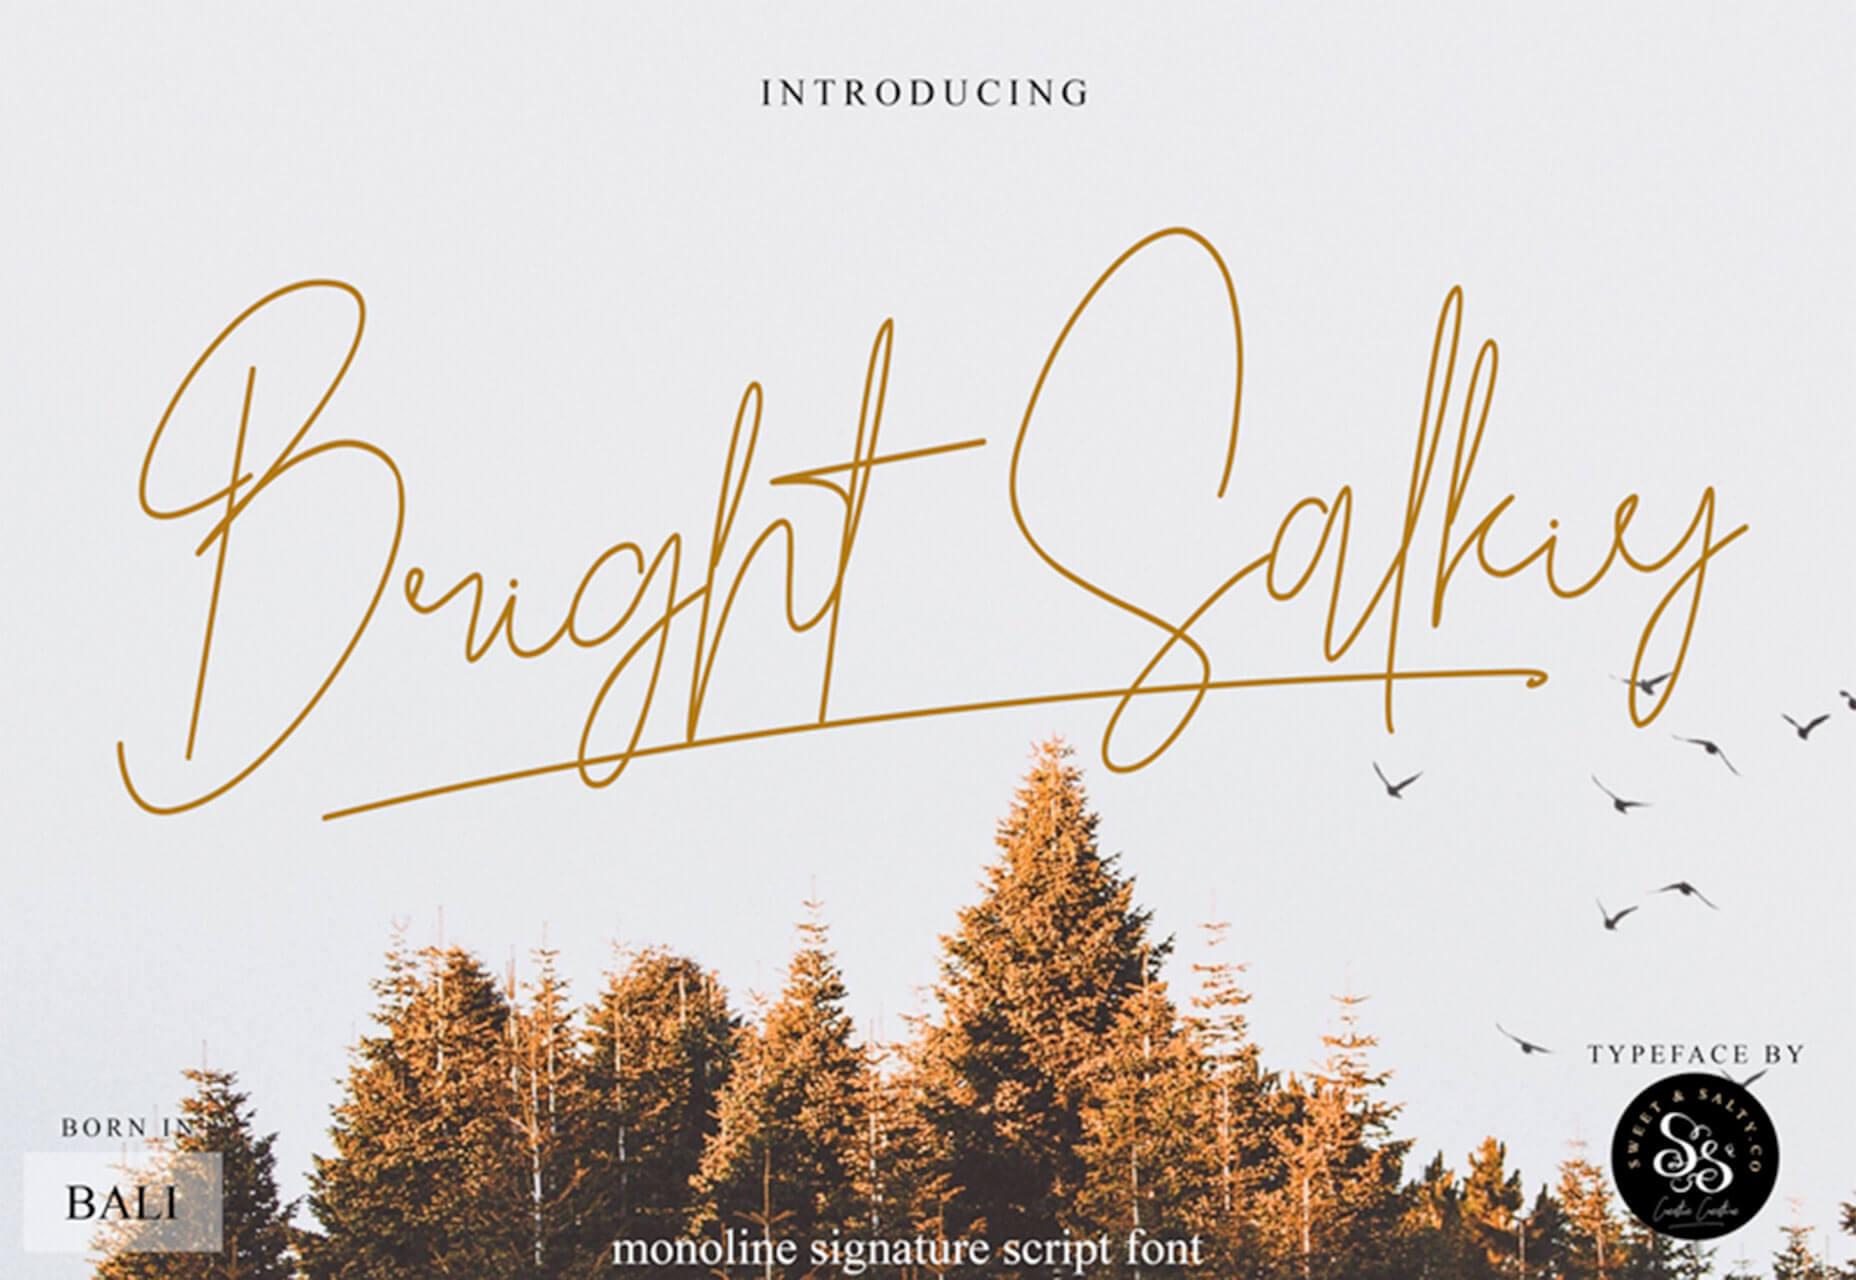 fonte Bright Salkiy